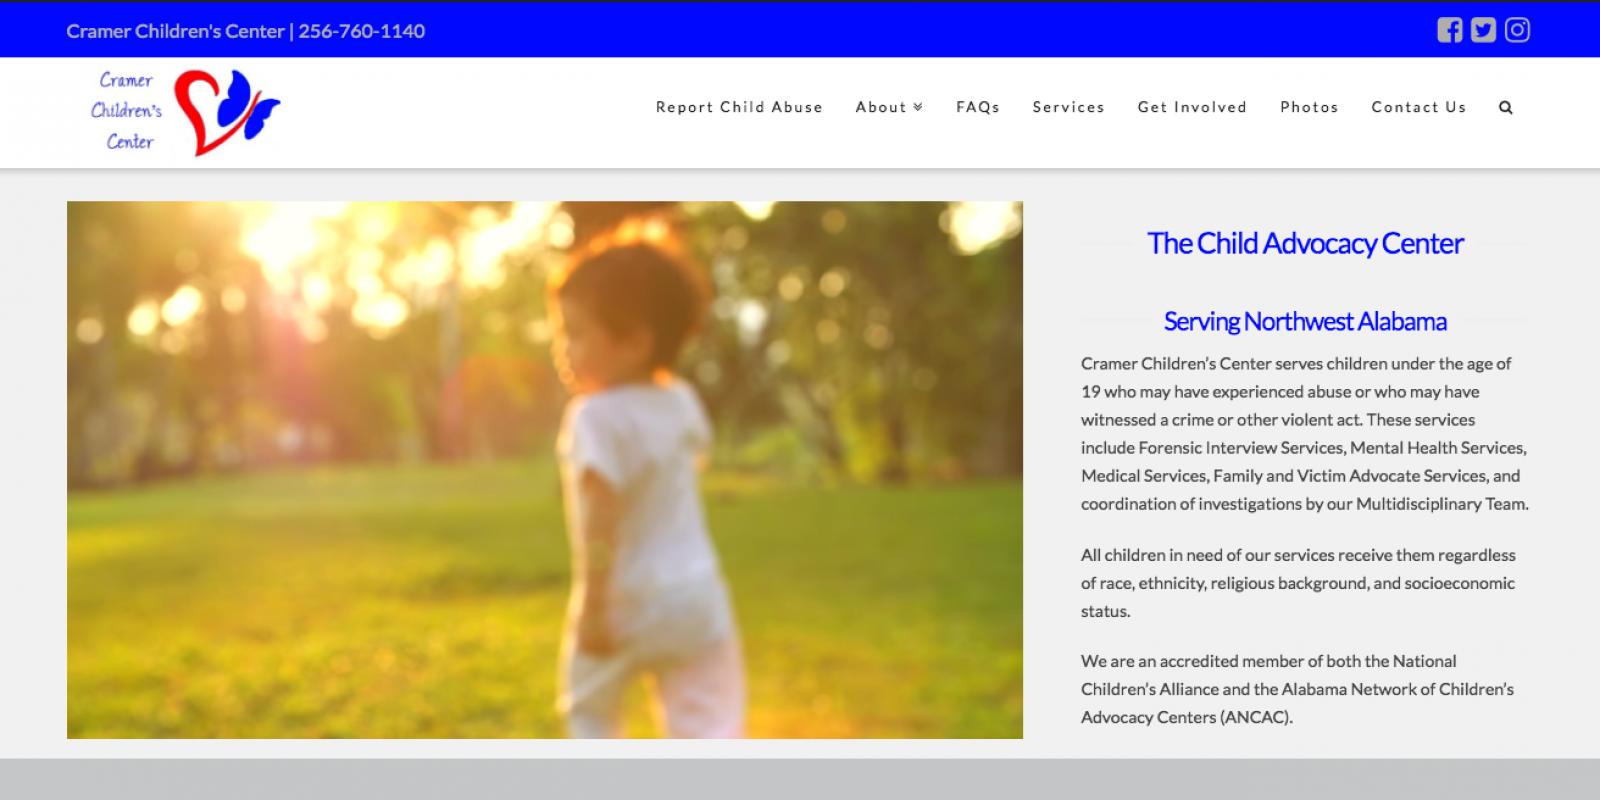 Shoals Works Client: Cramer Children's Center